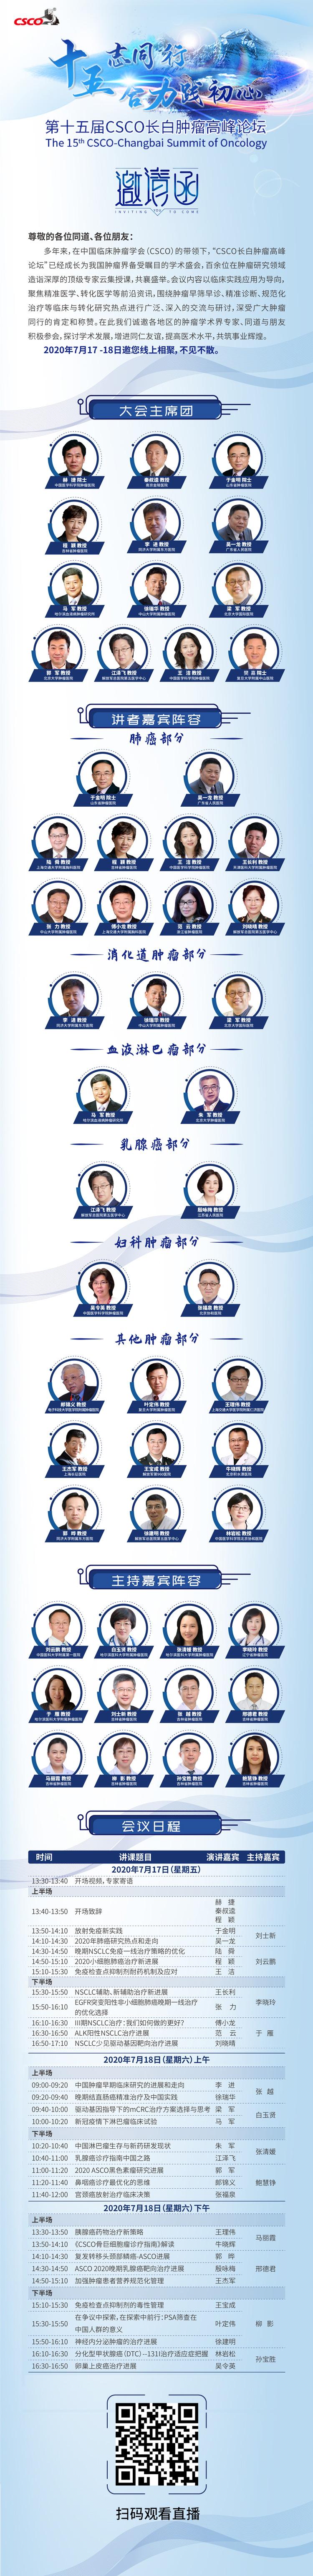 2020 CSCO长白肿瘤高峰论坛-预热海报-已换二维码.jpg